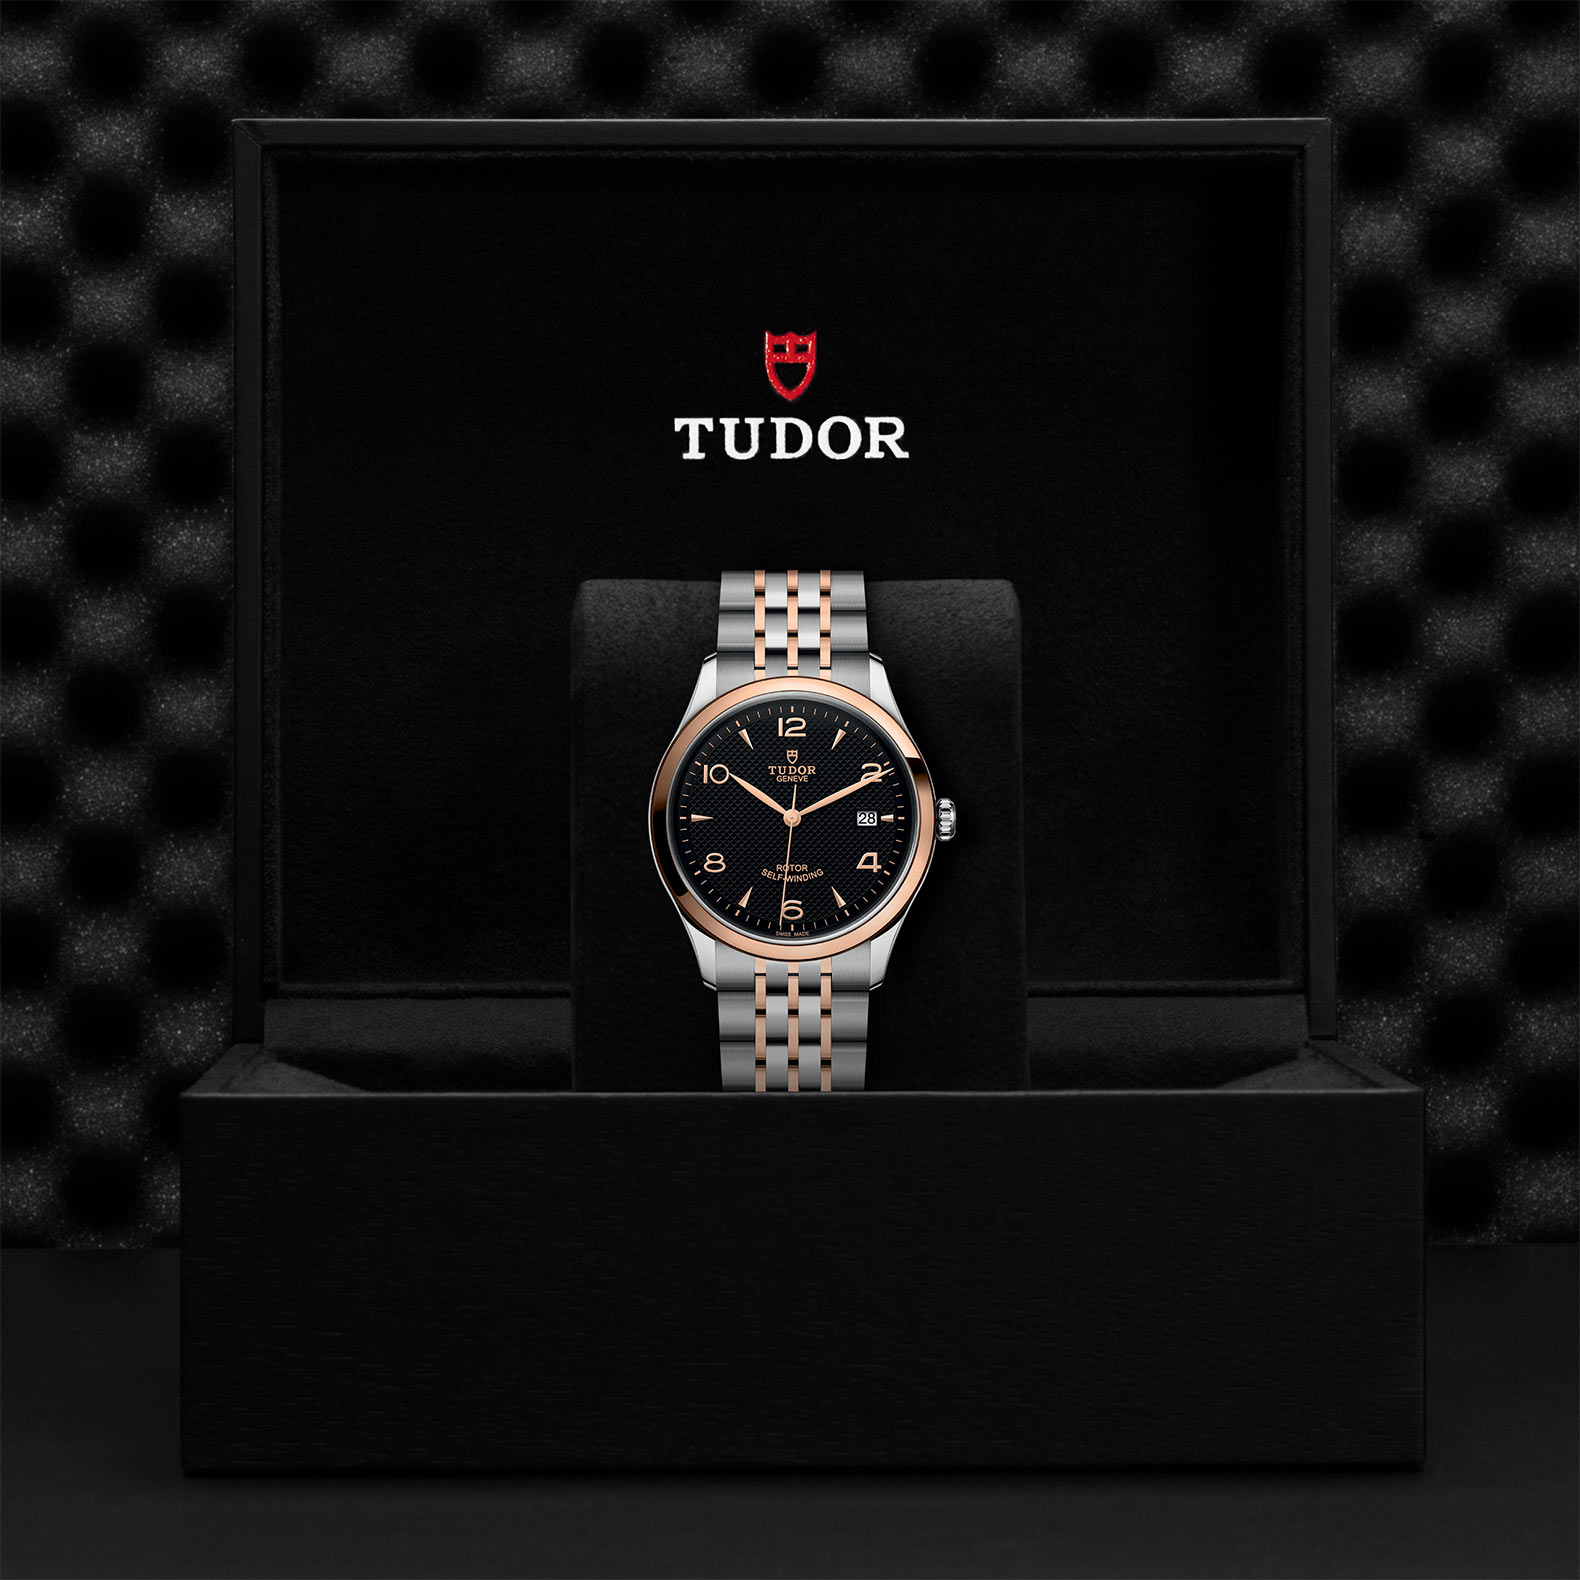 Tudor_M91551-0003